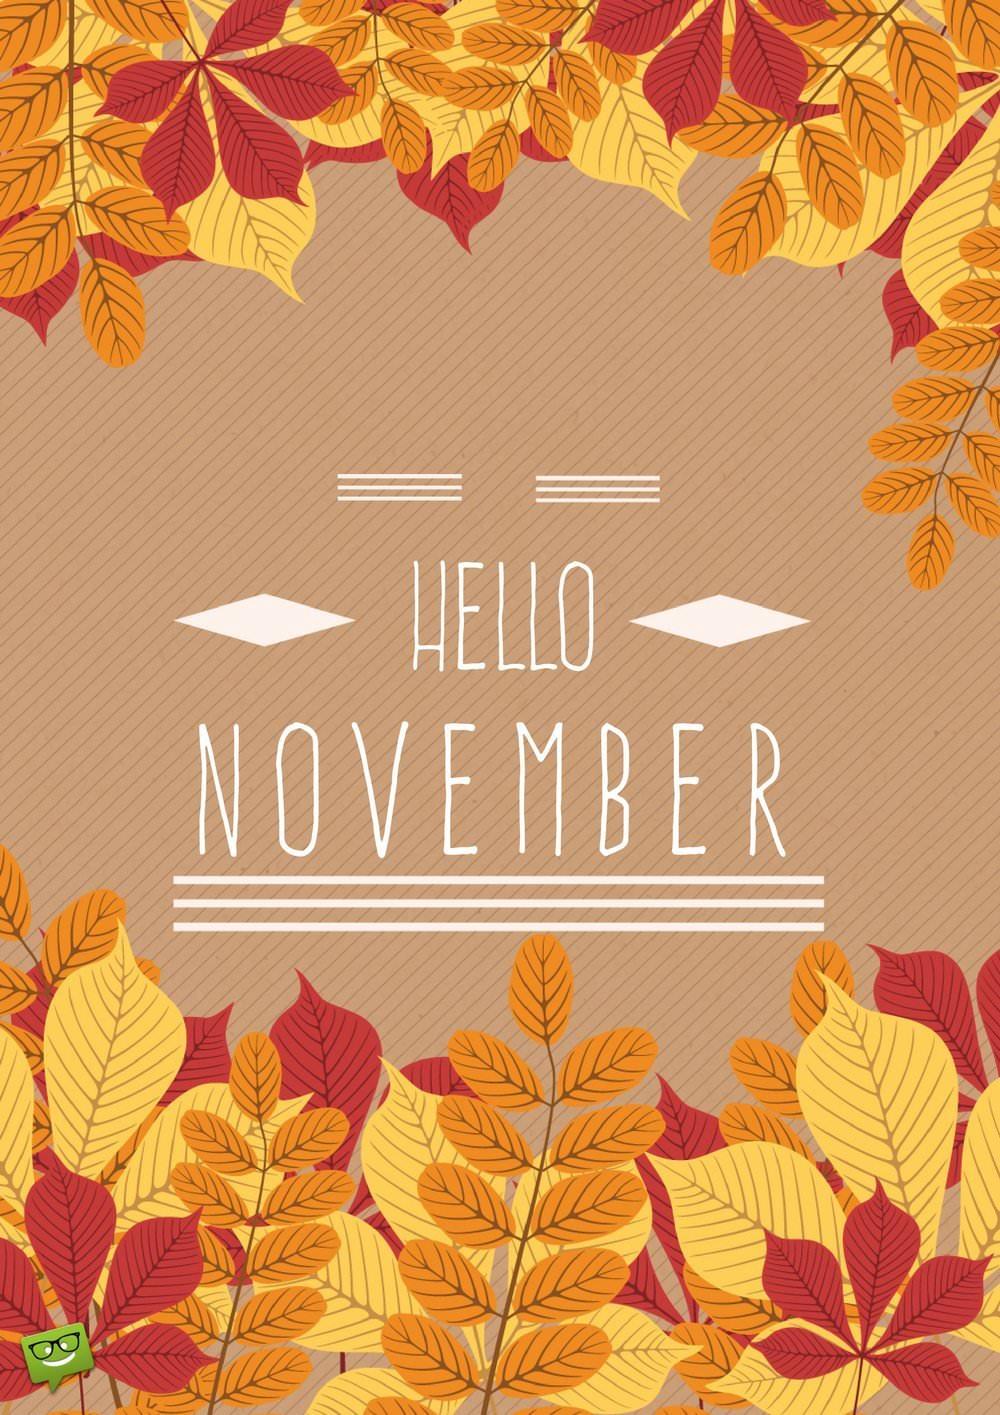 Привет ноябрь картинки (18)